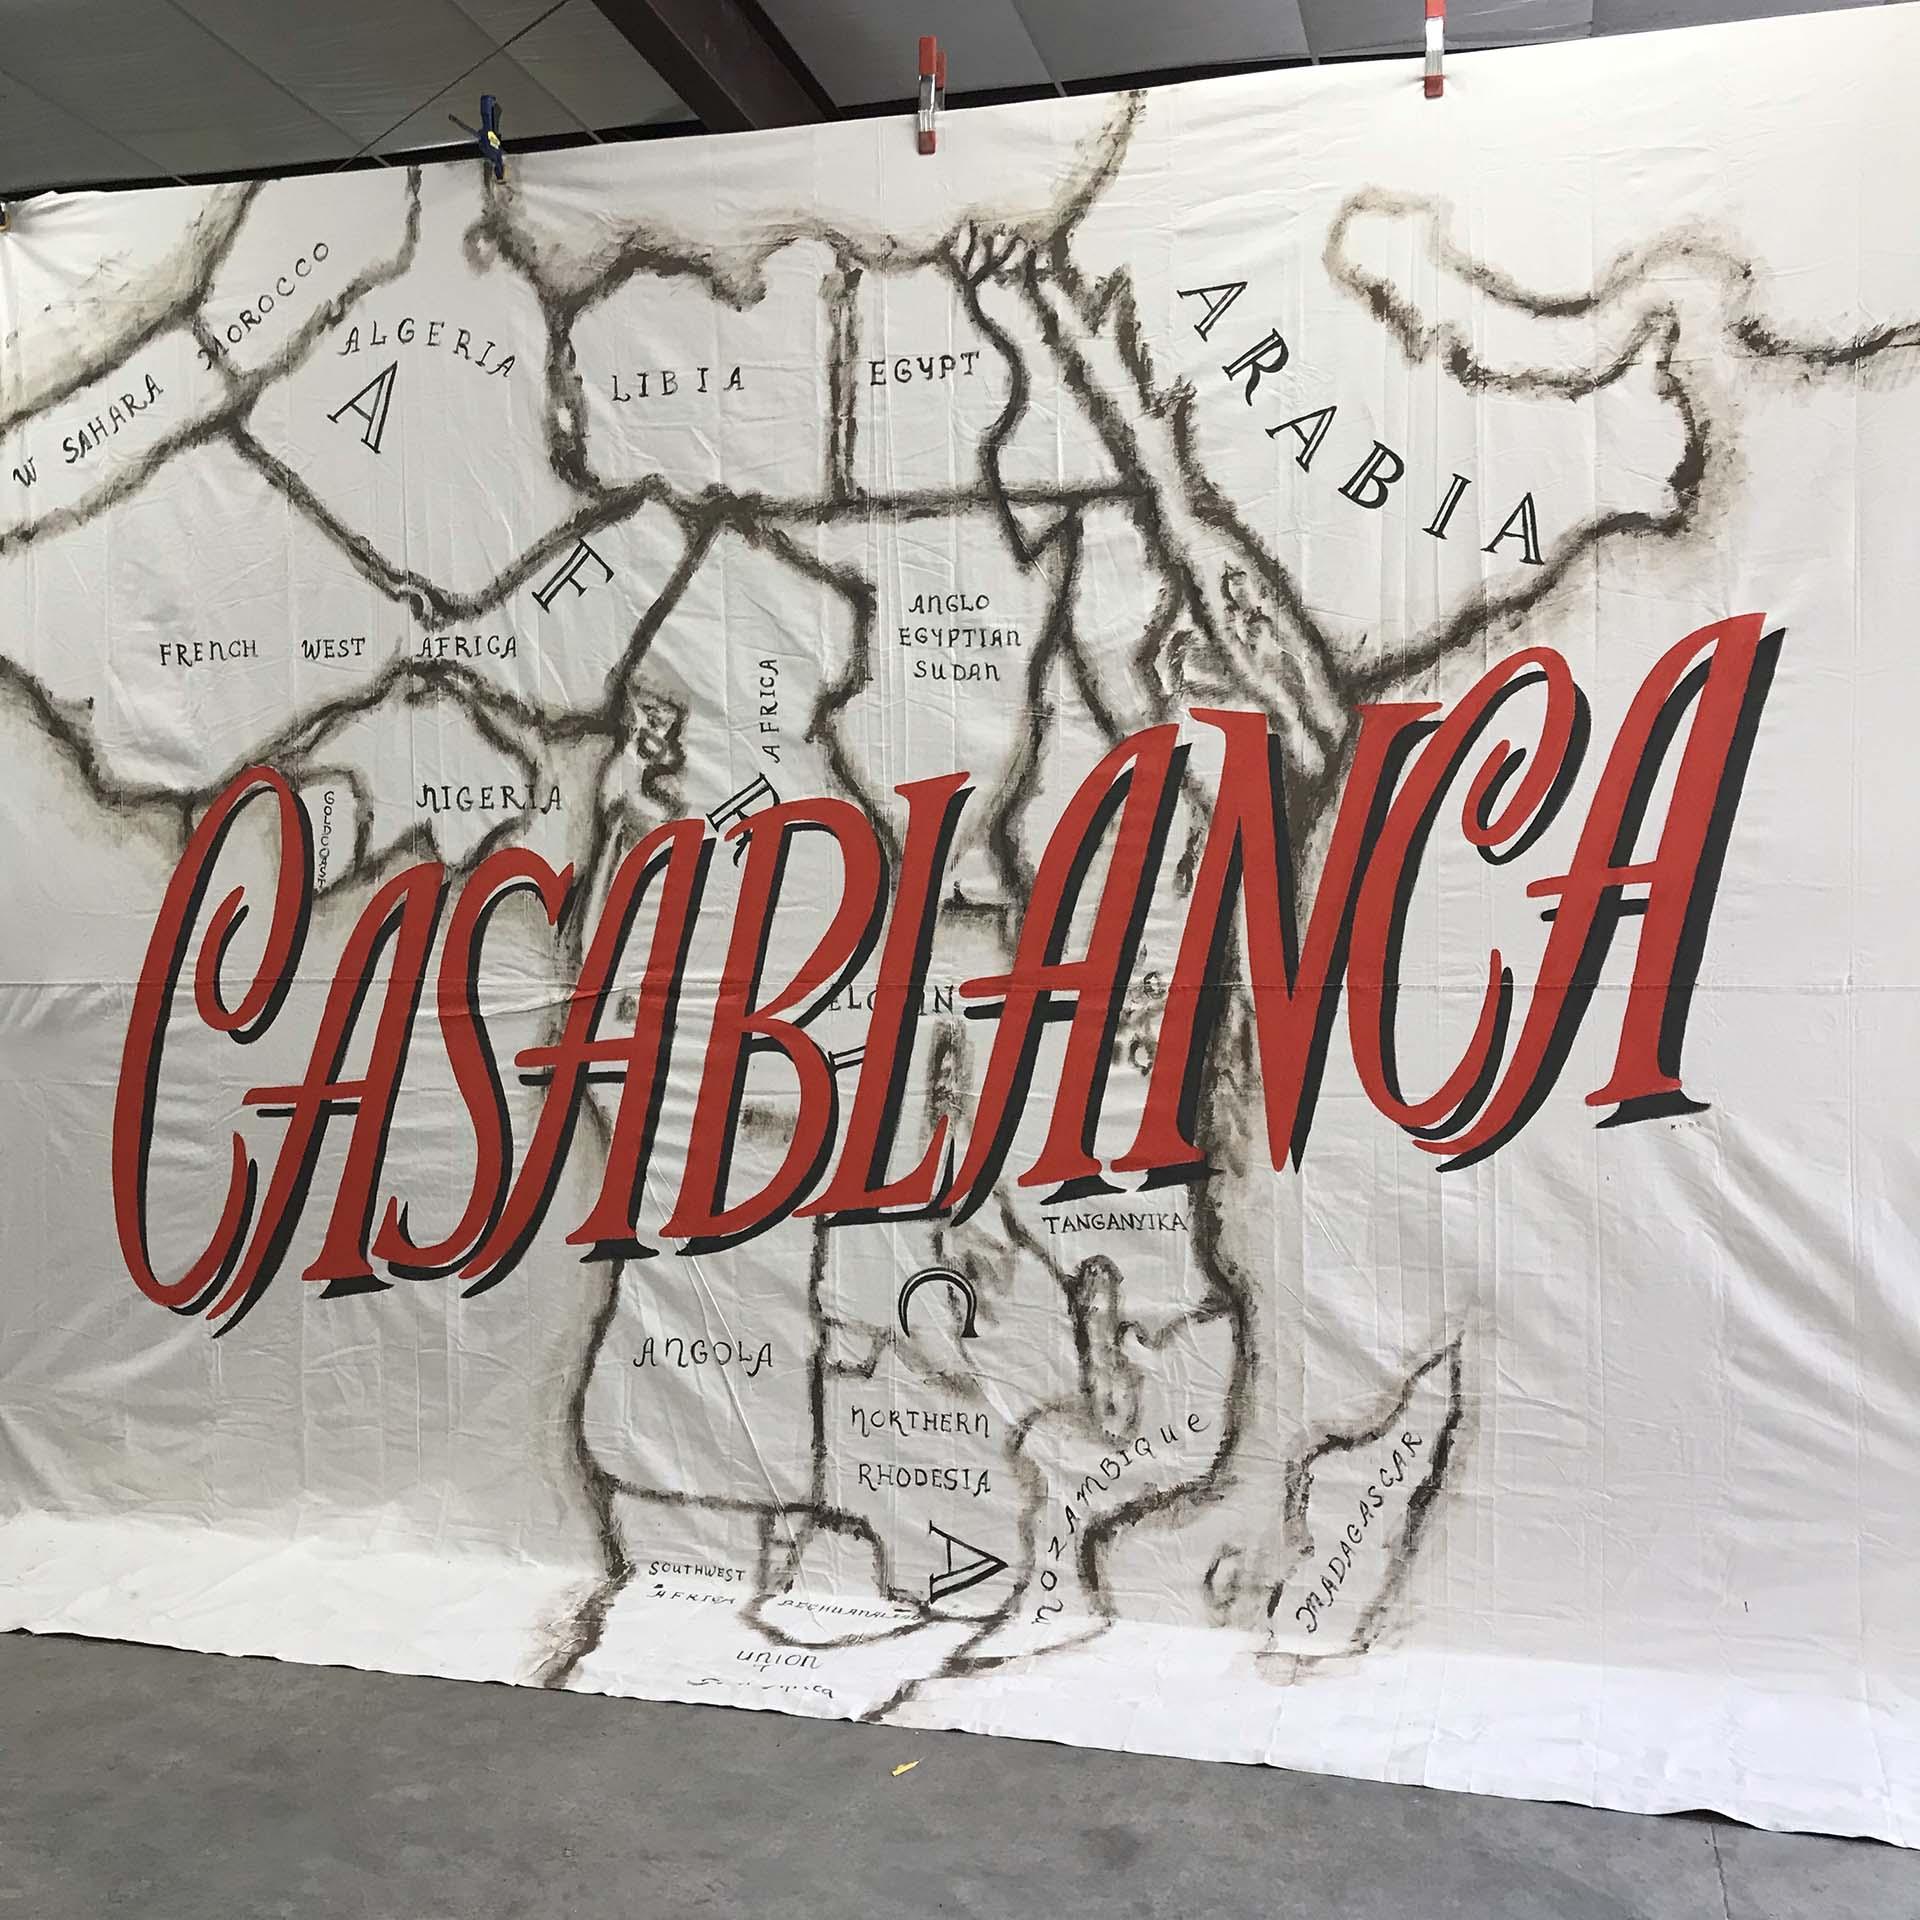 Casablanca - map mural - sign mural - map mural - hand lettering - custom mural - mural - Dace Kidd - Mural Artist Tx